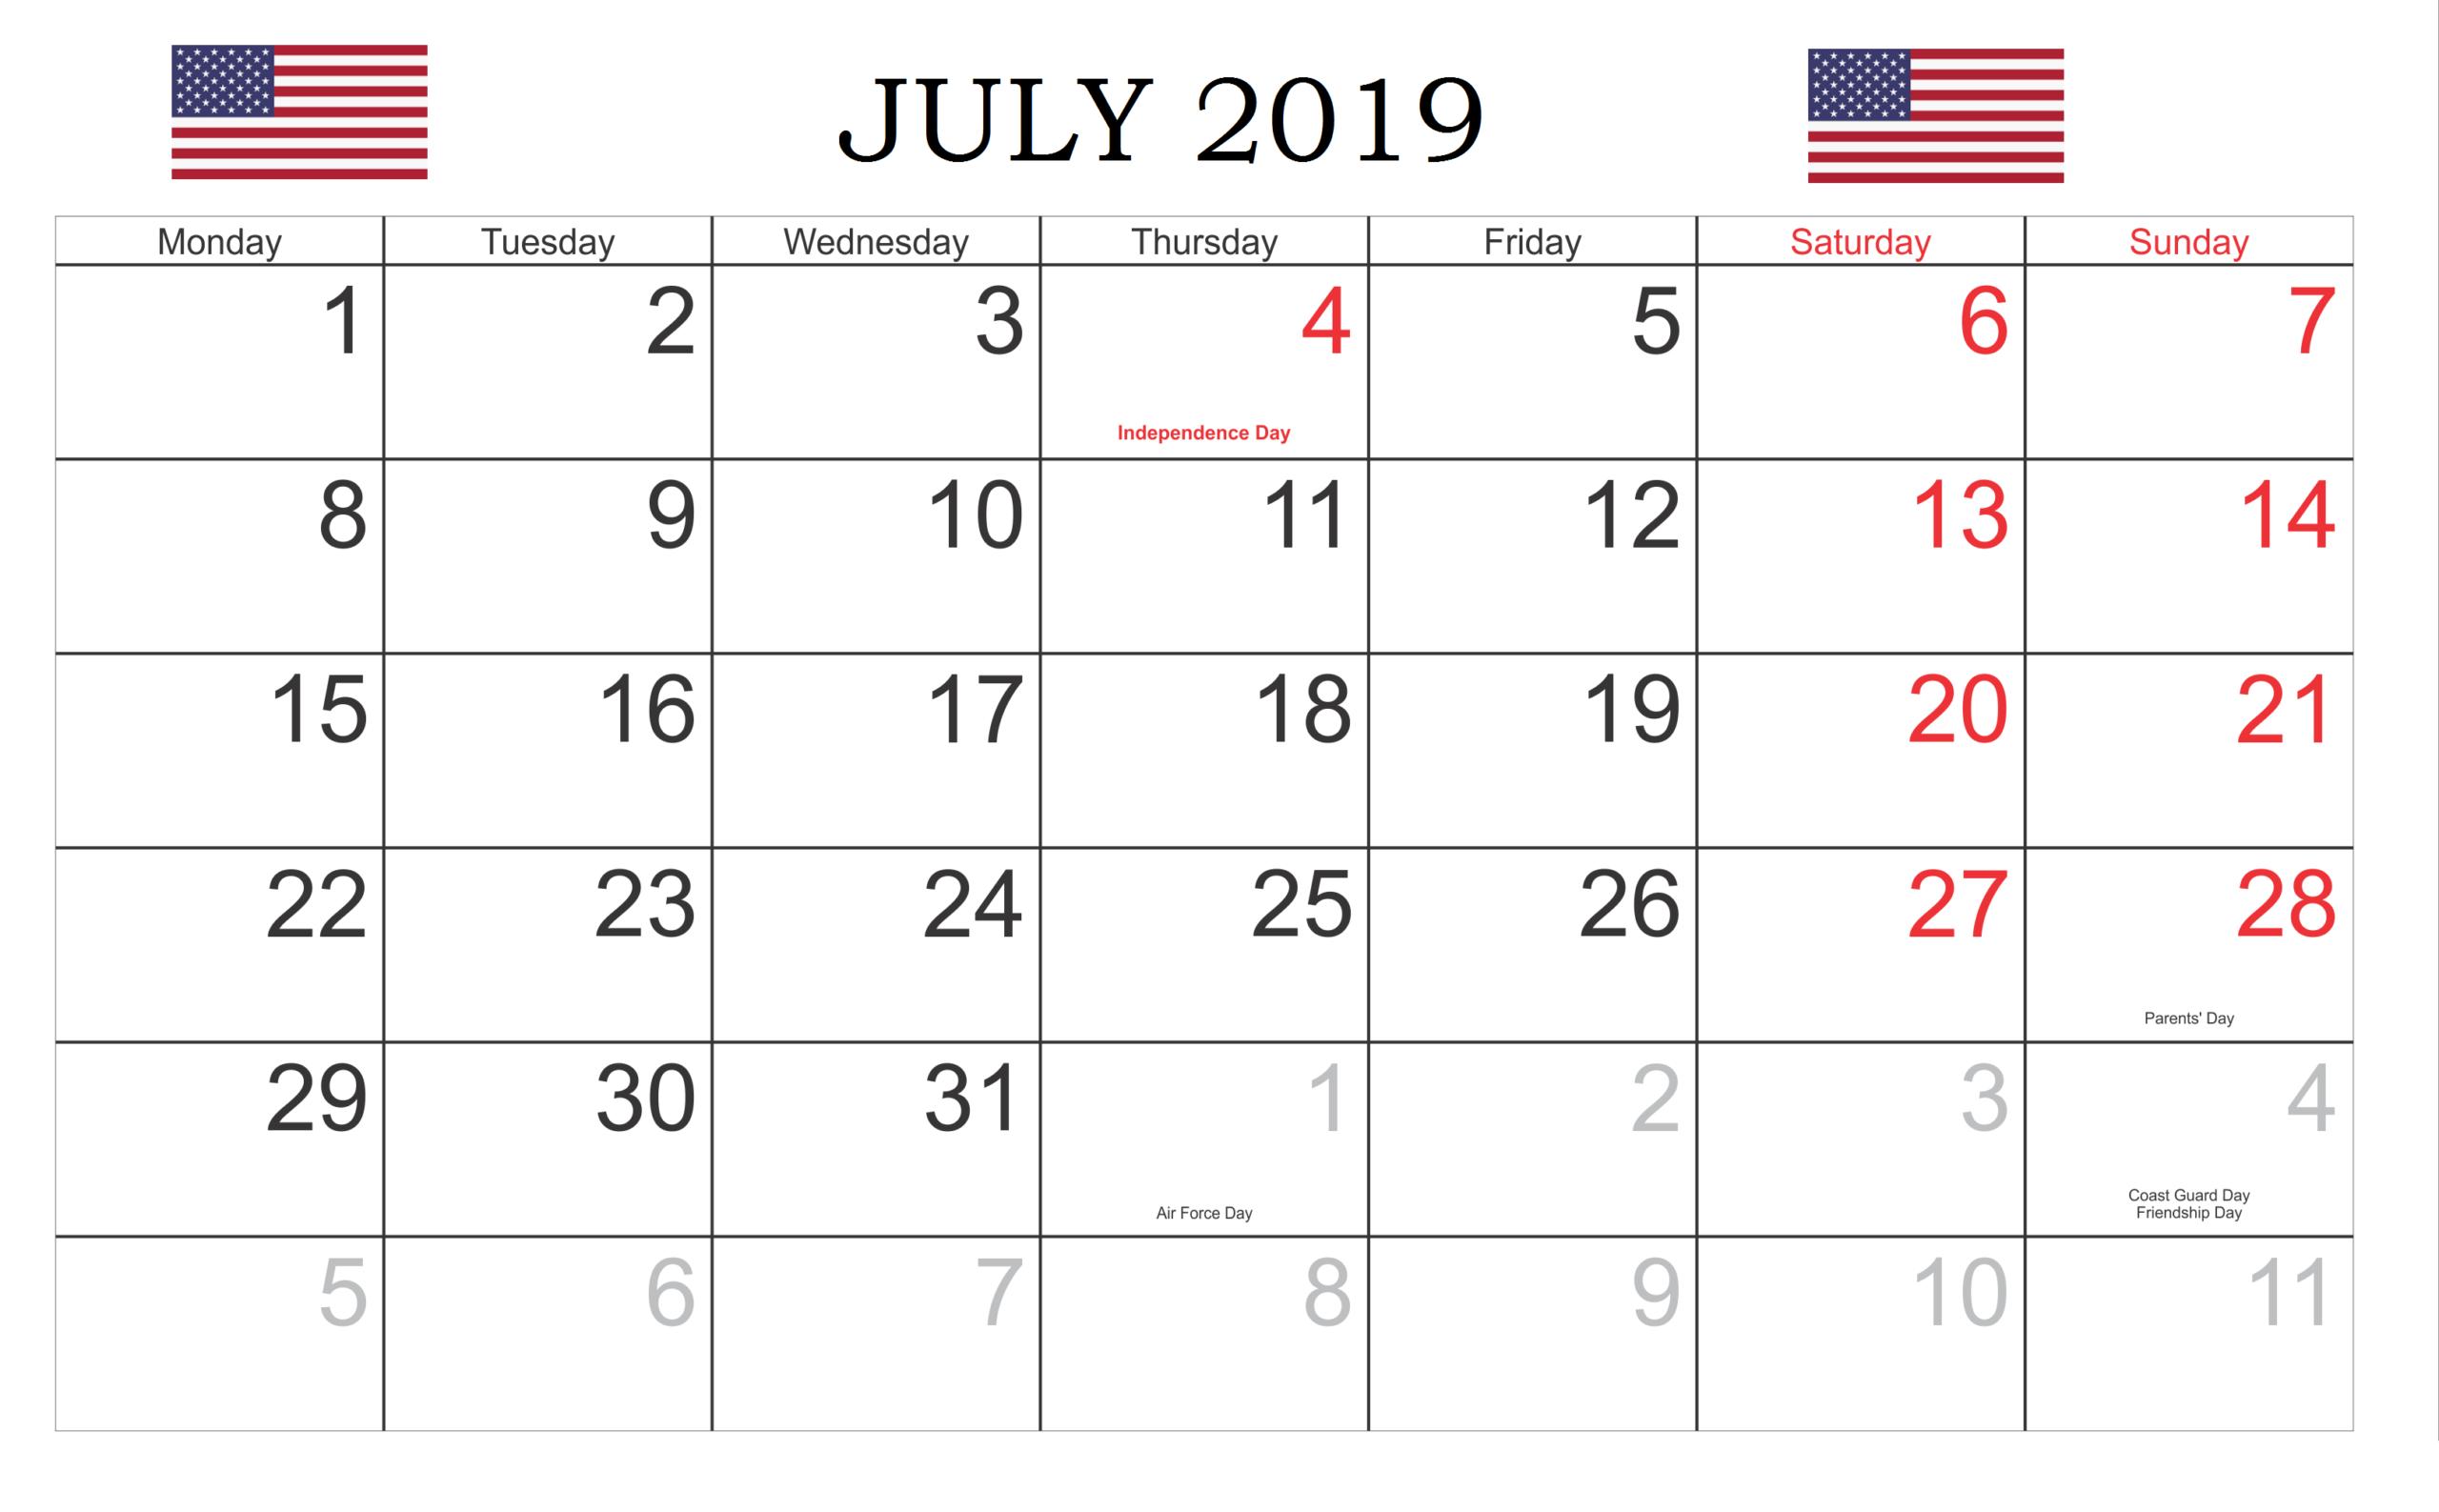 July 2019 Usa Holidays Calendar  Local And Federal regarding Federal Holidays 2025